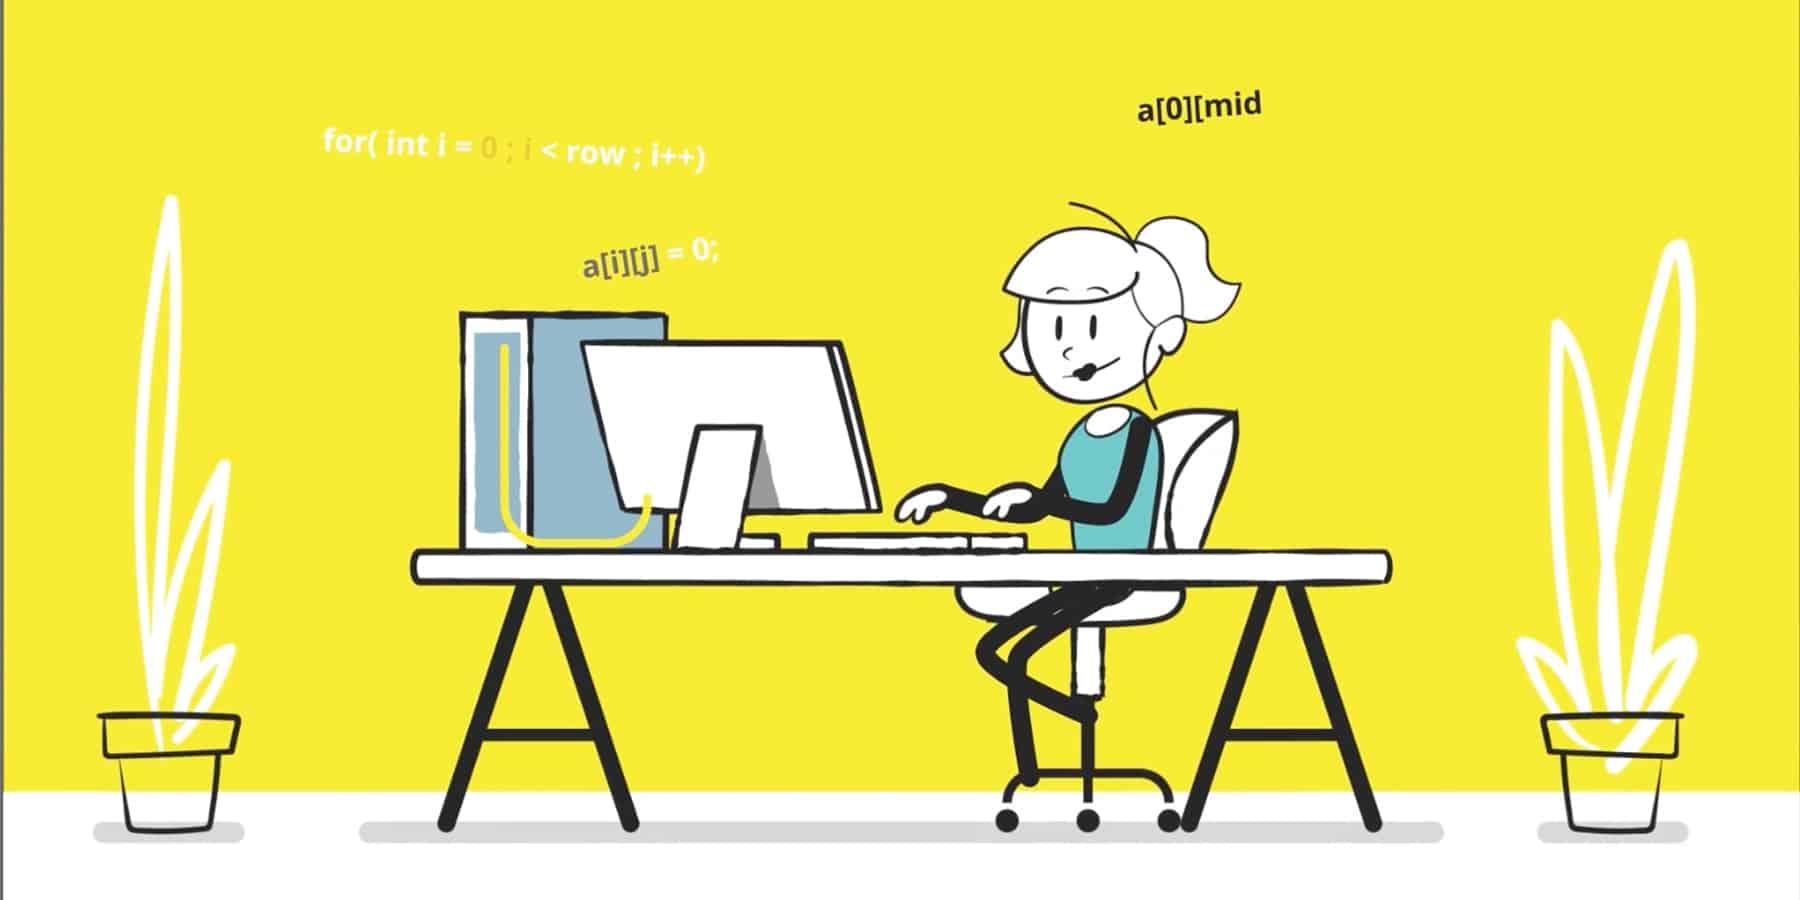 Wyzowl S Matt Byrom Explains Why Animation Works In Marketing